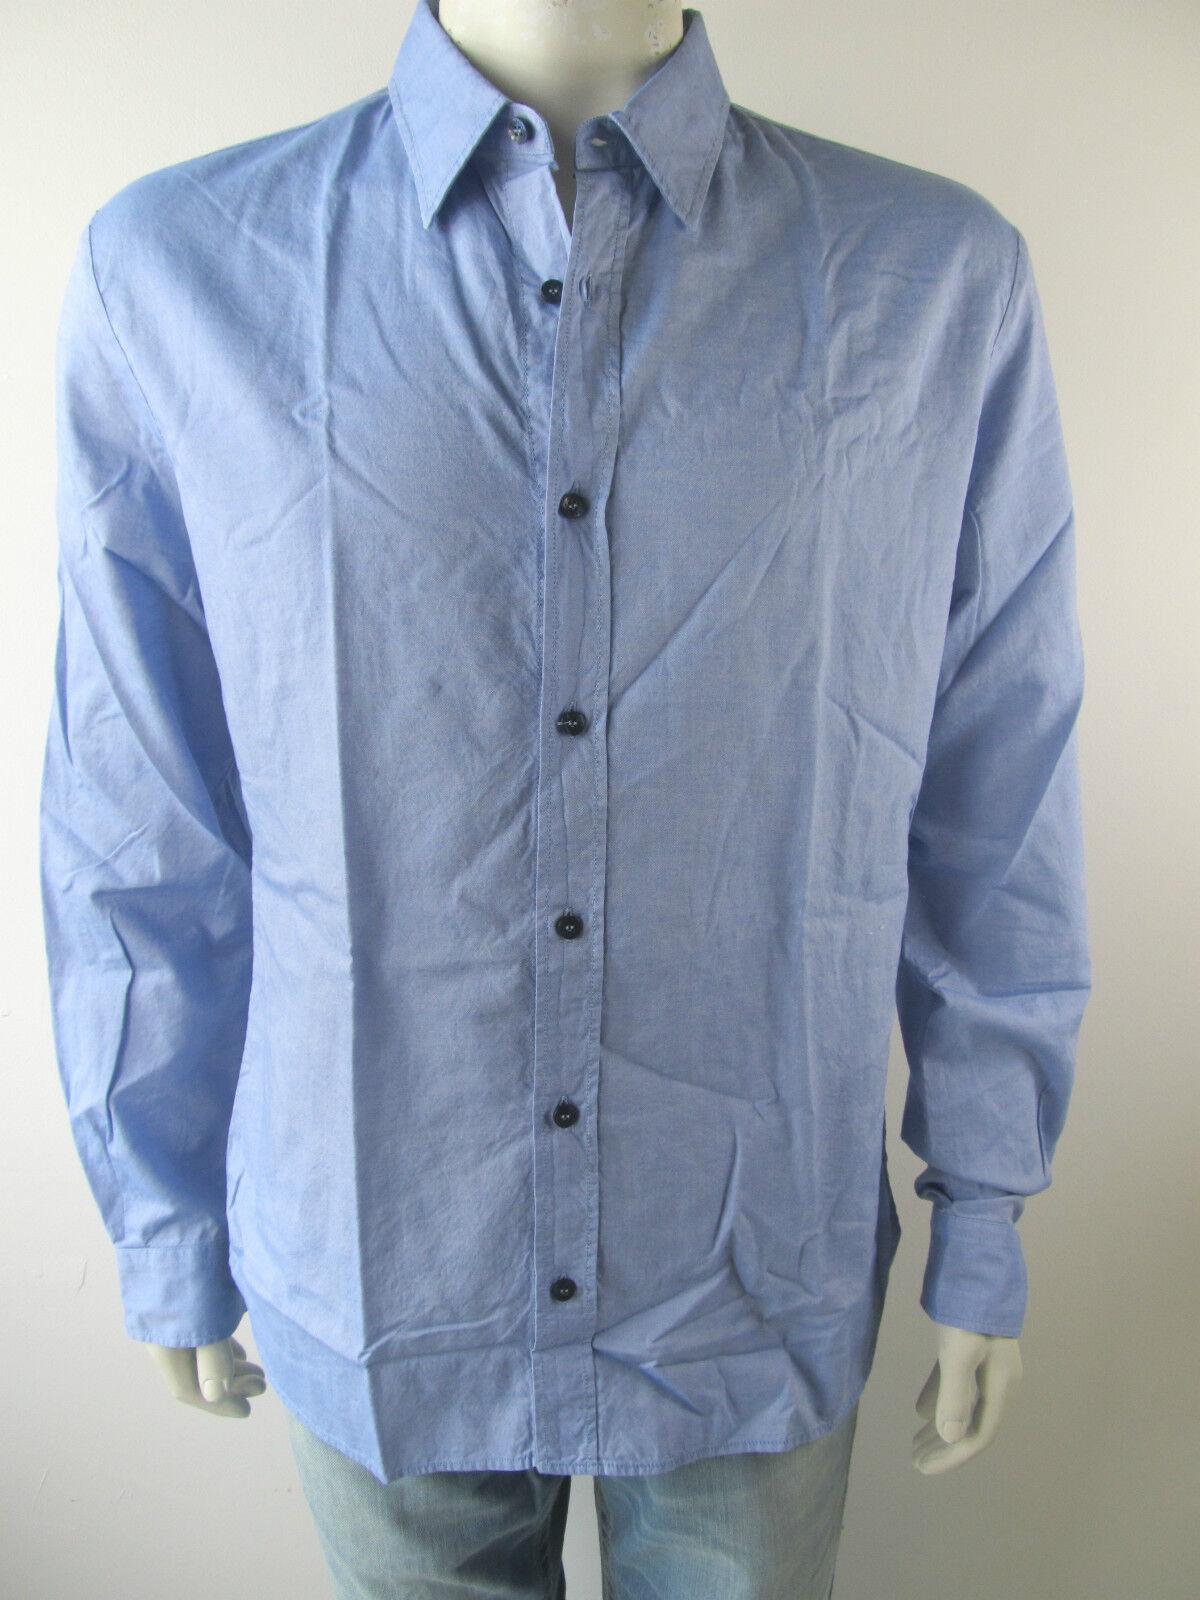 John Galliano Jeans Hemd Shirt Camicia XR26B1 Neu 54 L XL     Vorzugspreis